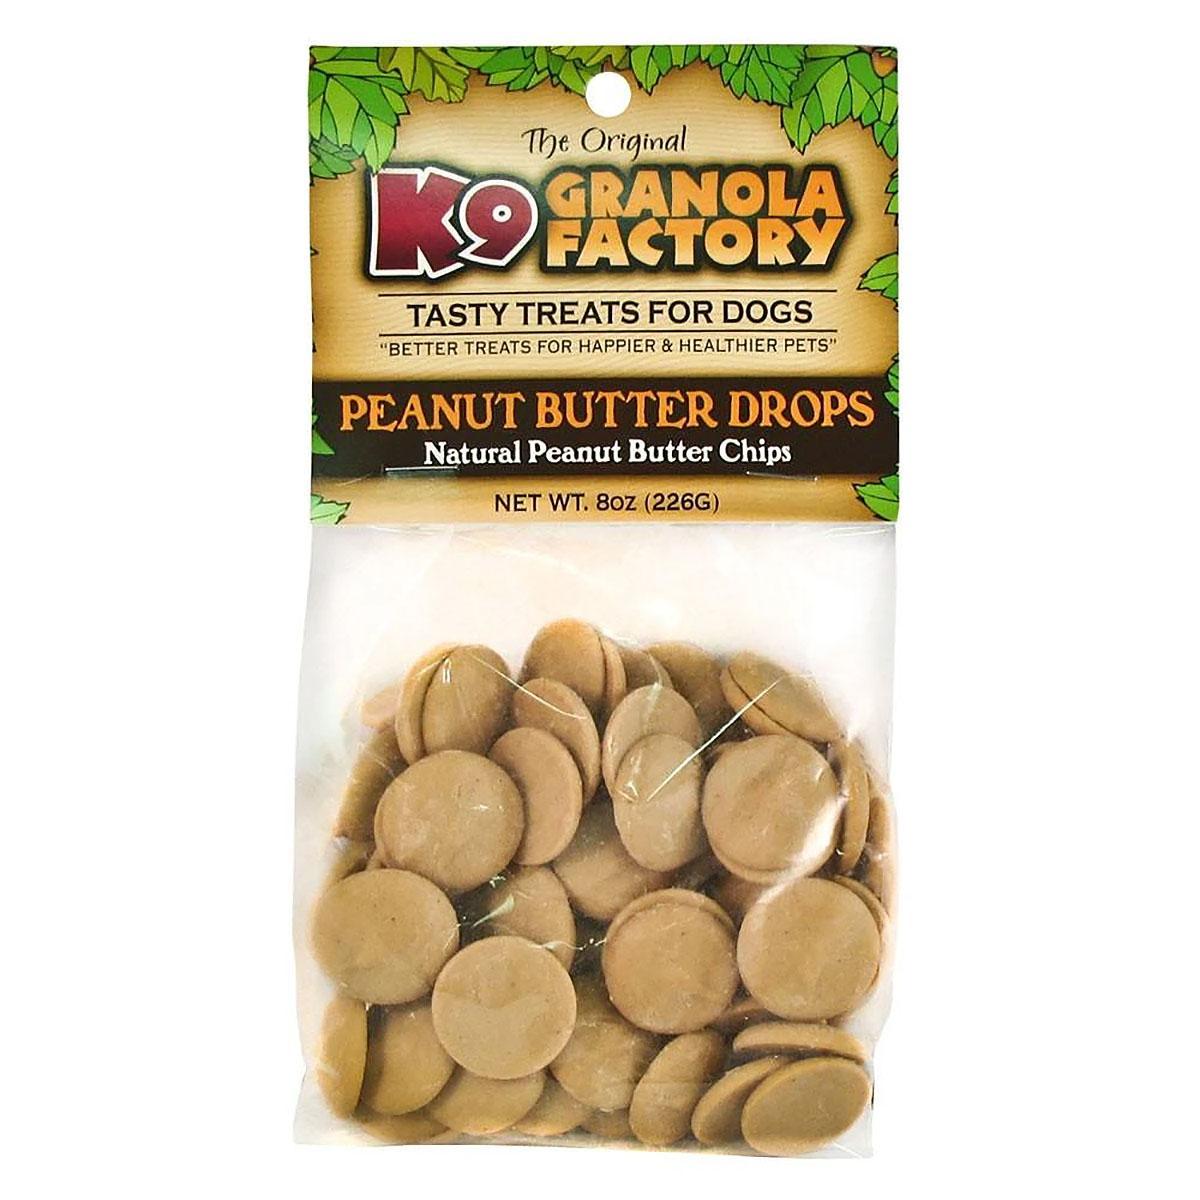 K9 Granola Factory Peanut Butter Drops Dog Treat